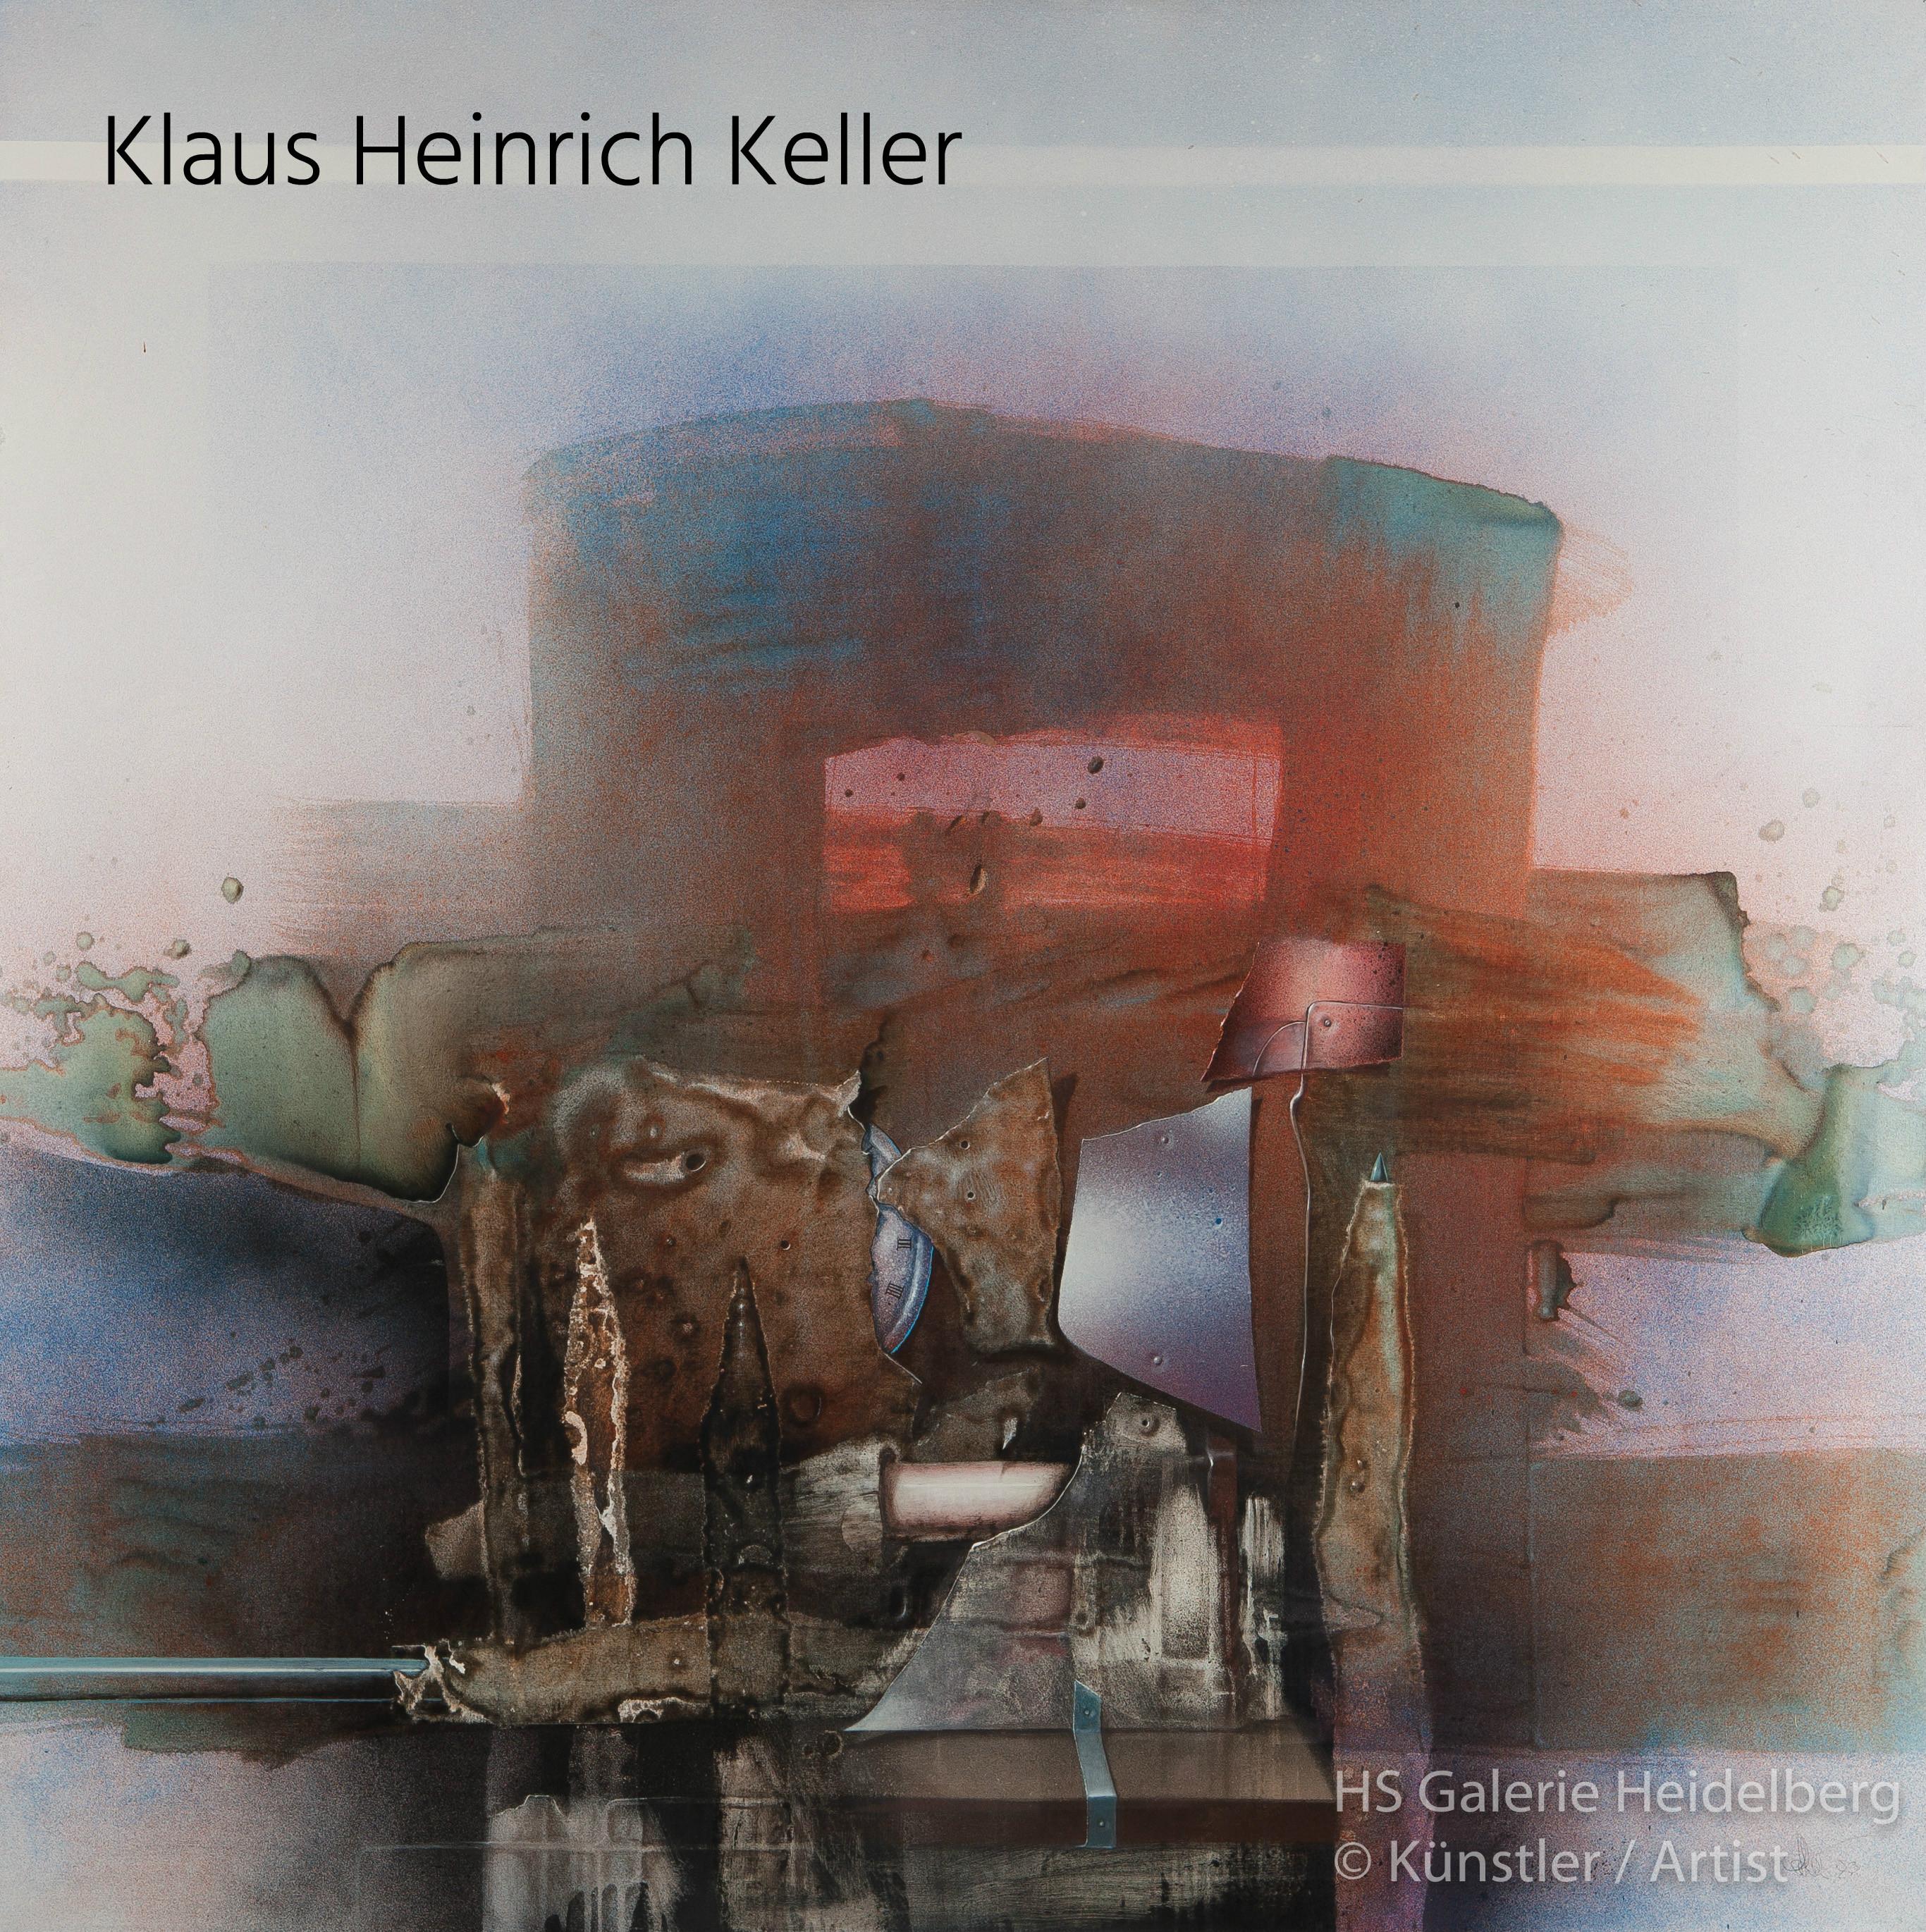 Künstler Heidelberg hs galerie